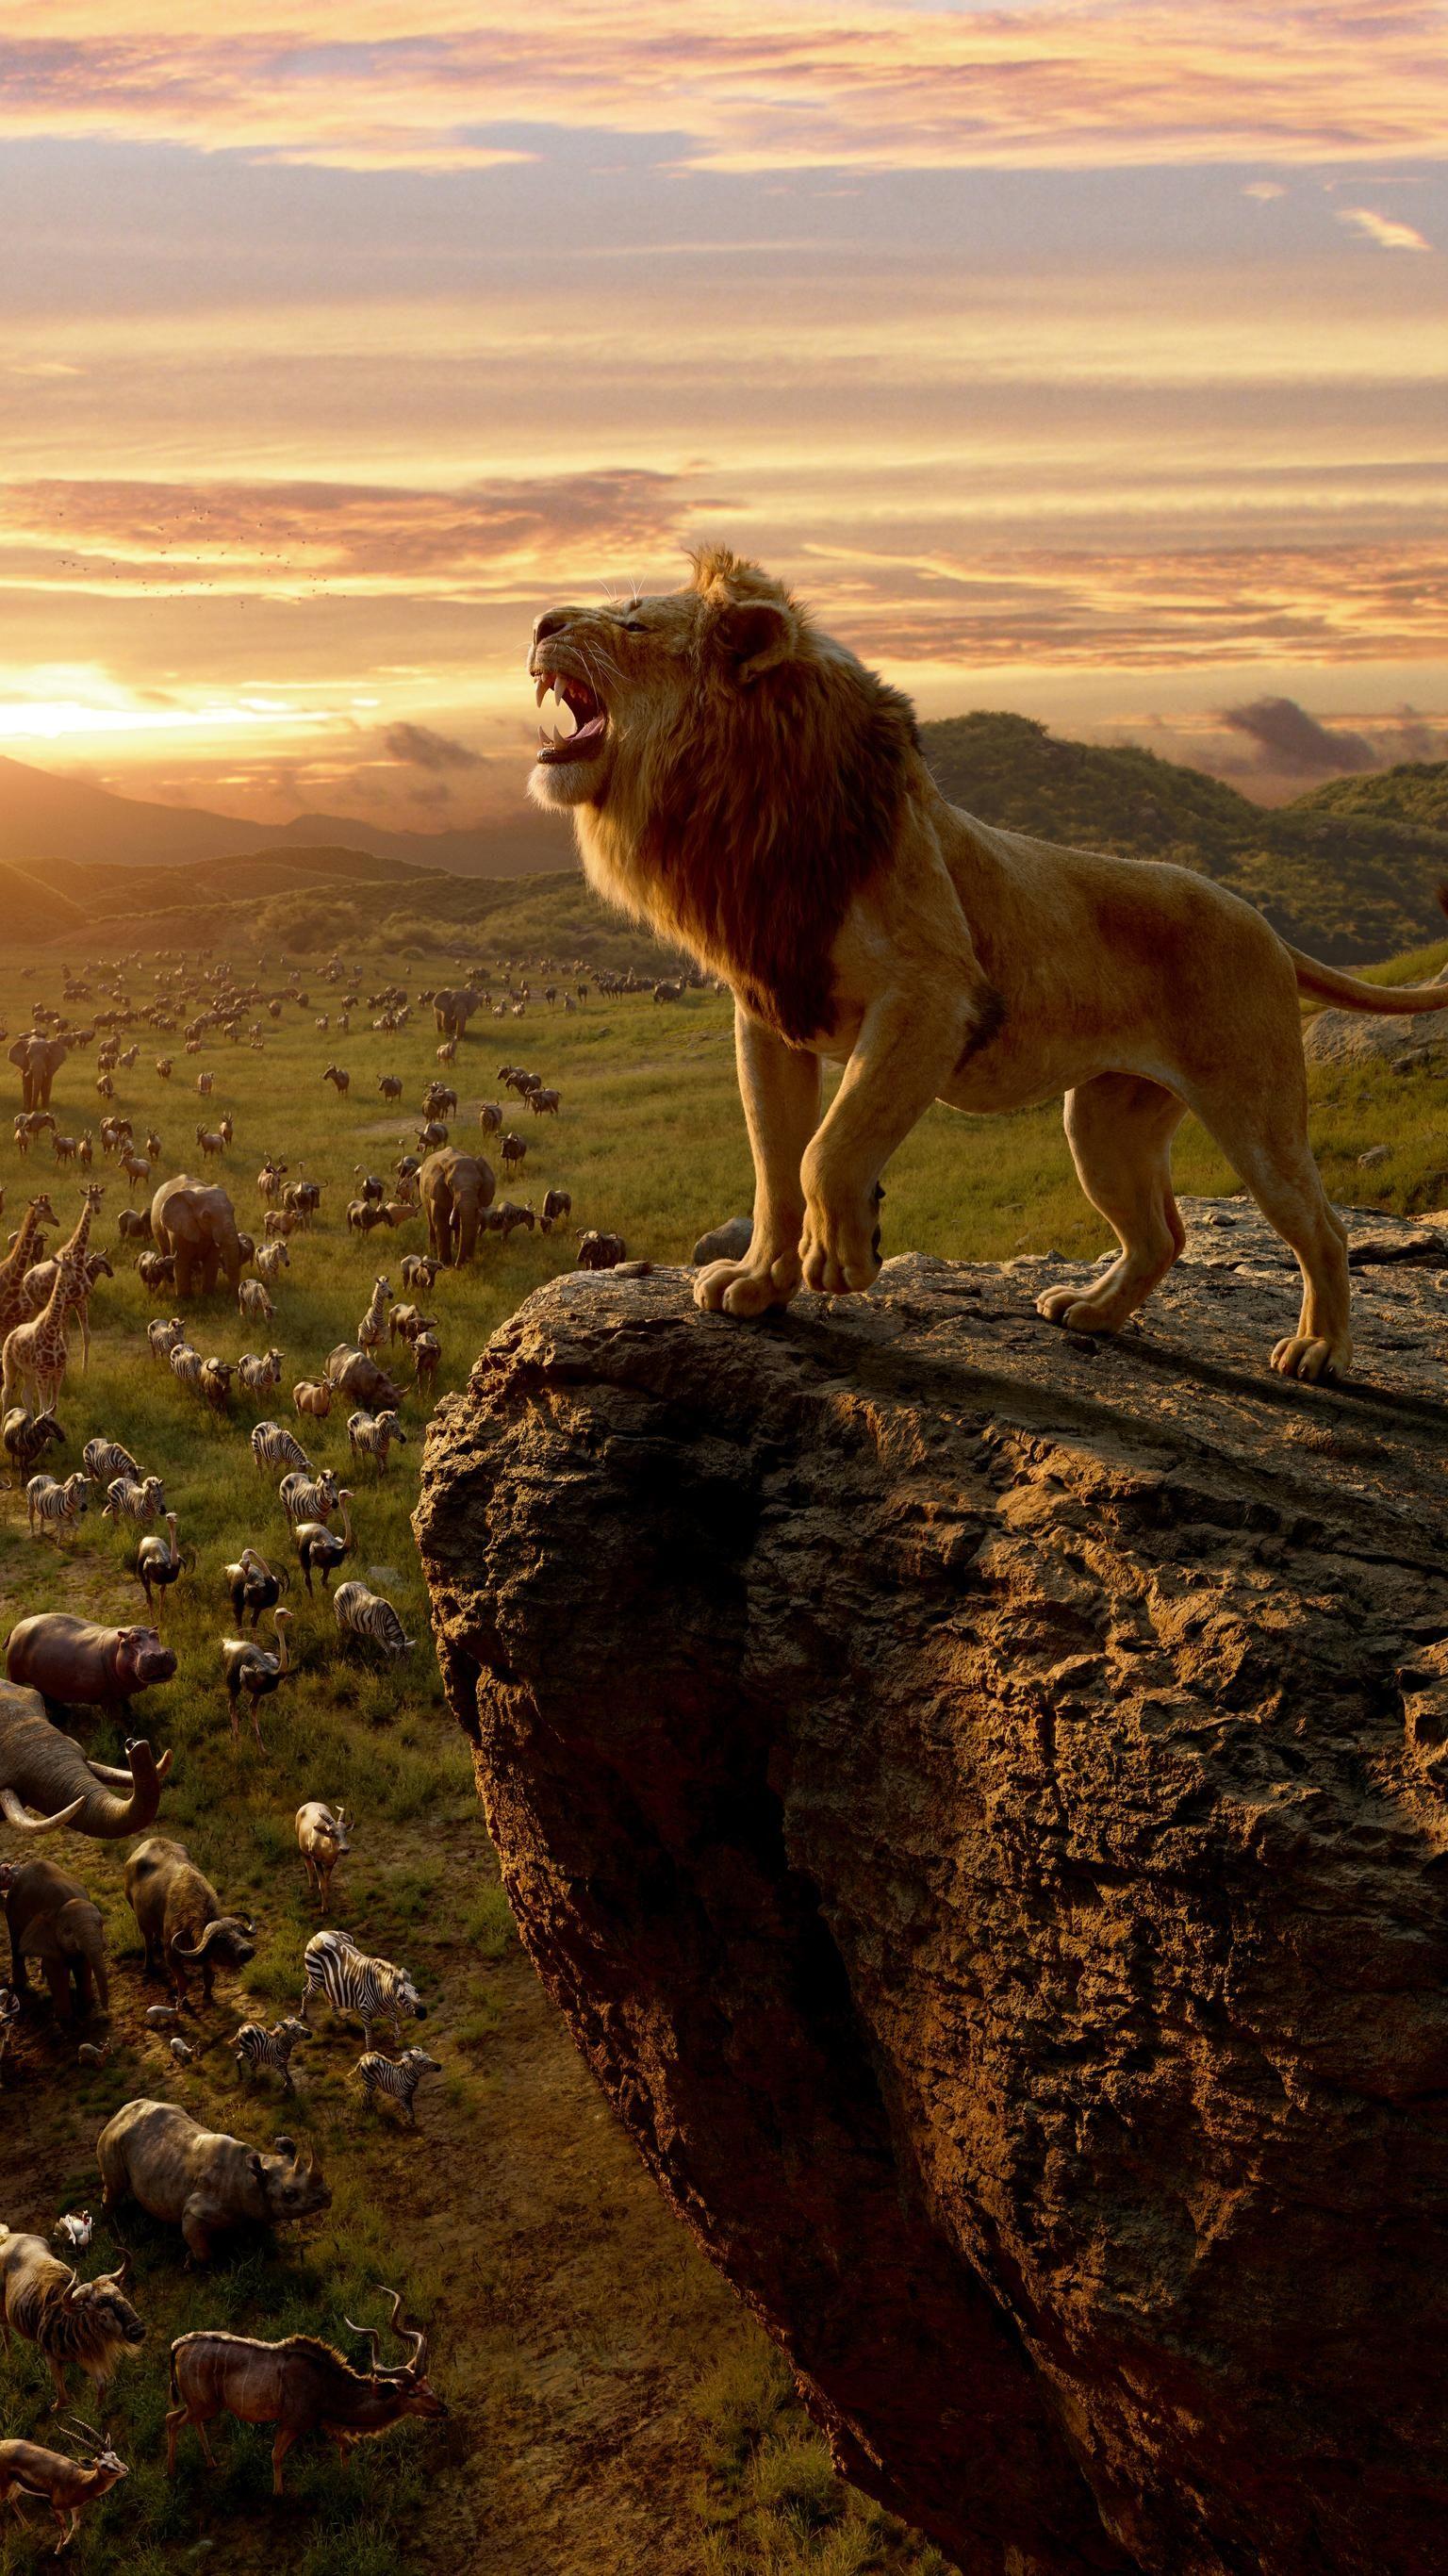 The Lion King 2019 Phone Wallpaper Fotos Rei Leao Rei Leao Disney Desenhos